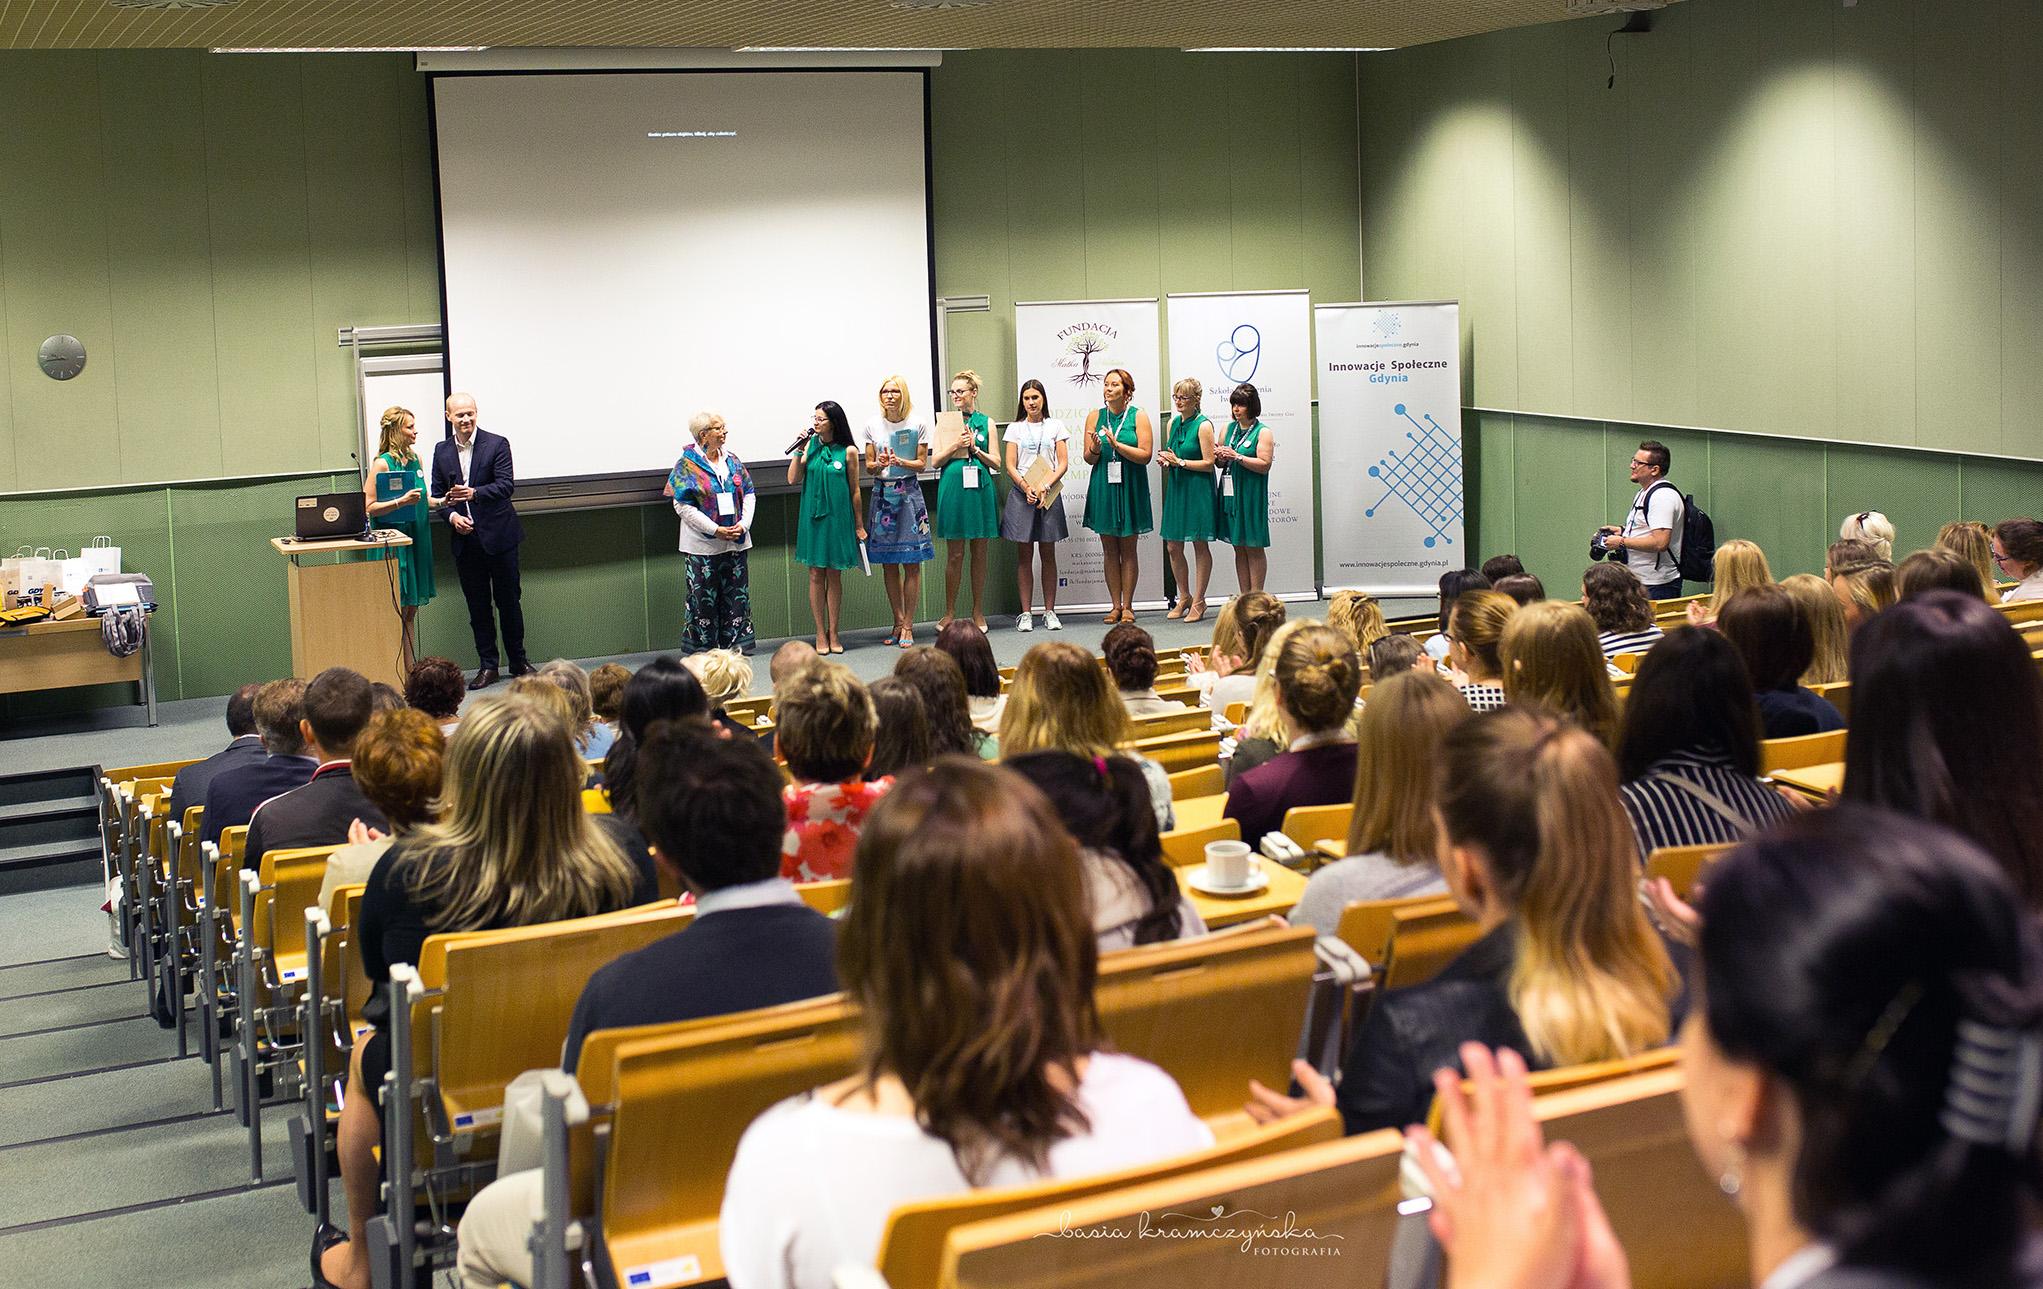 konferencja-laktacyjna-hipoalergiczni-patronat-conference